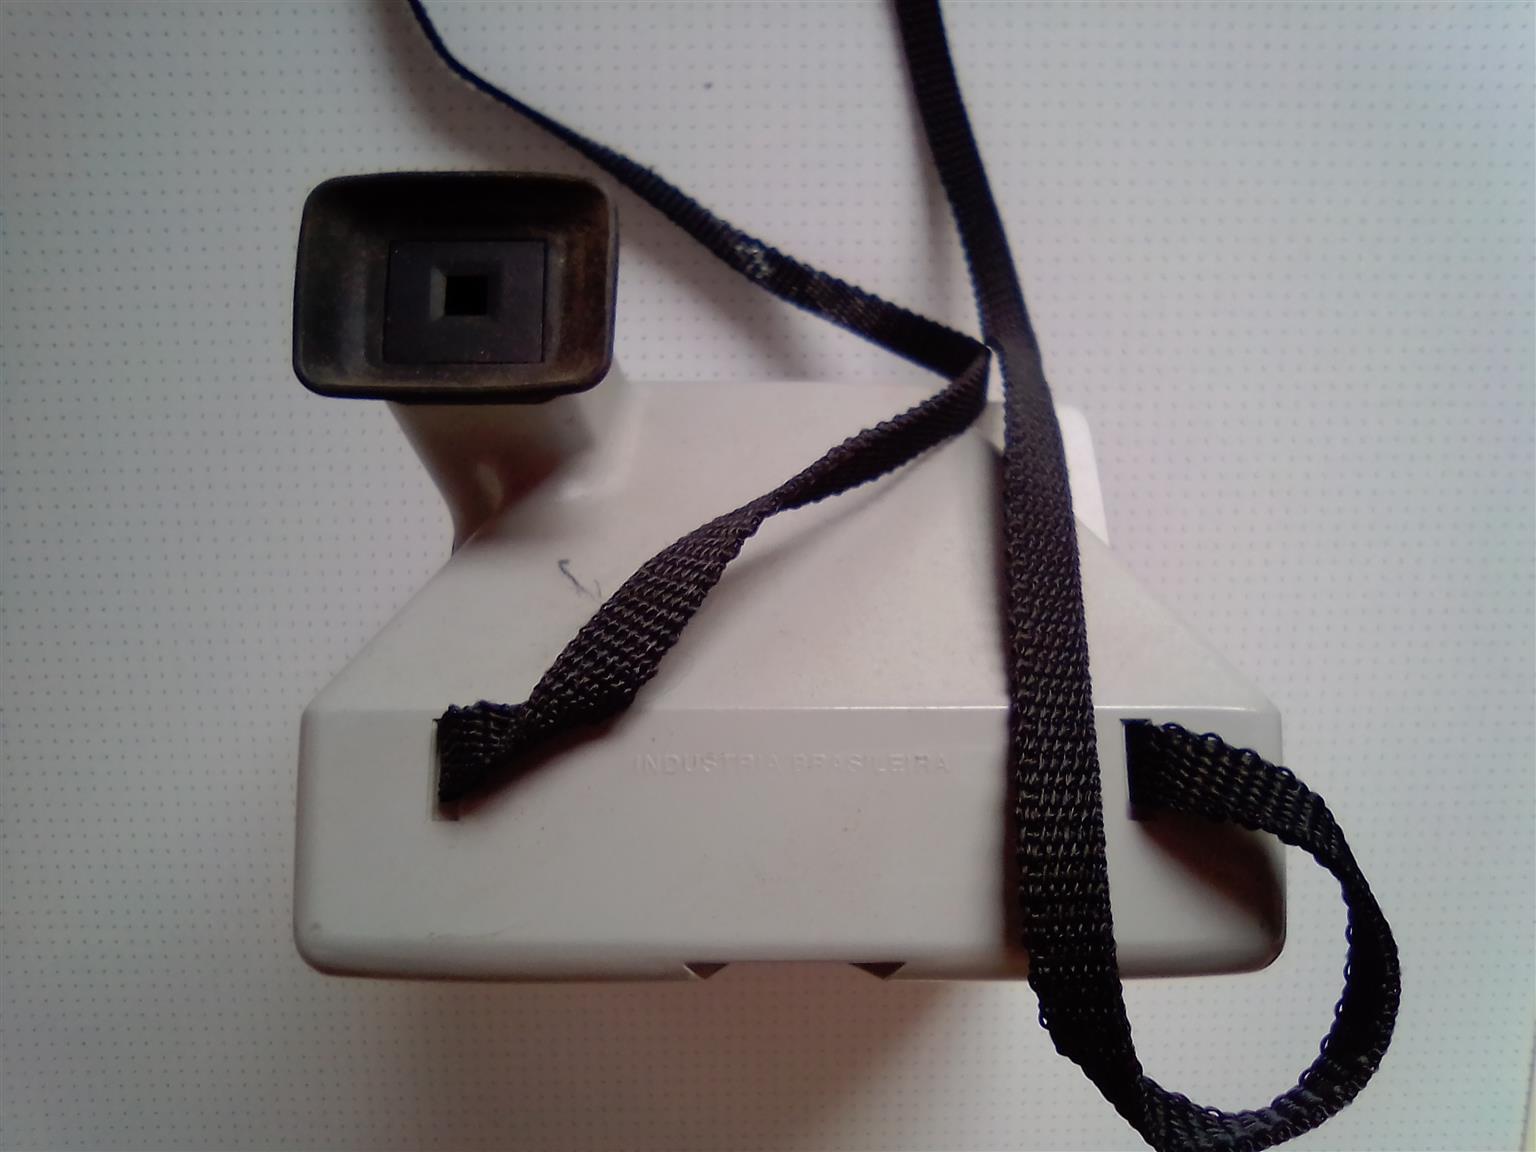 Polaroid Photo Camera. For instant photos.